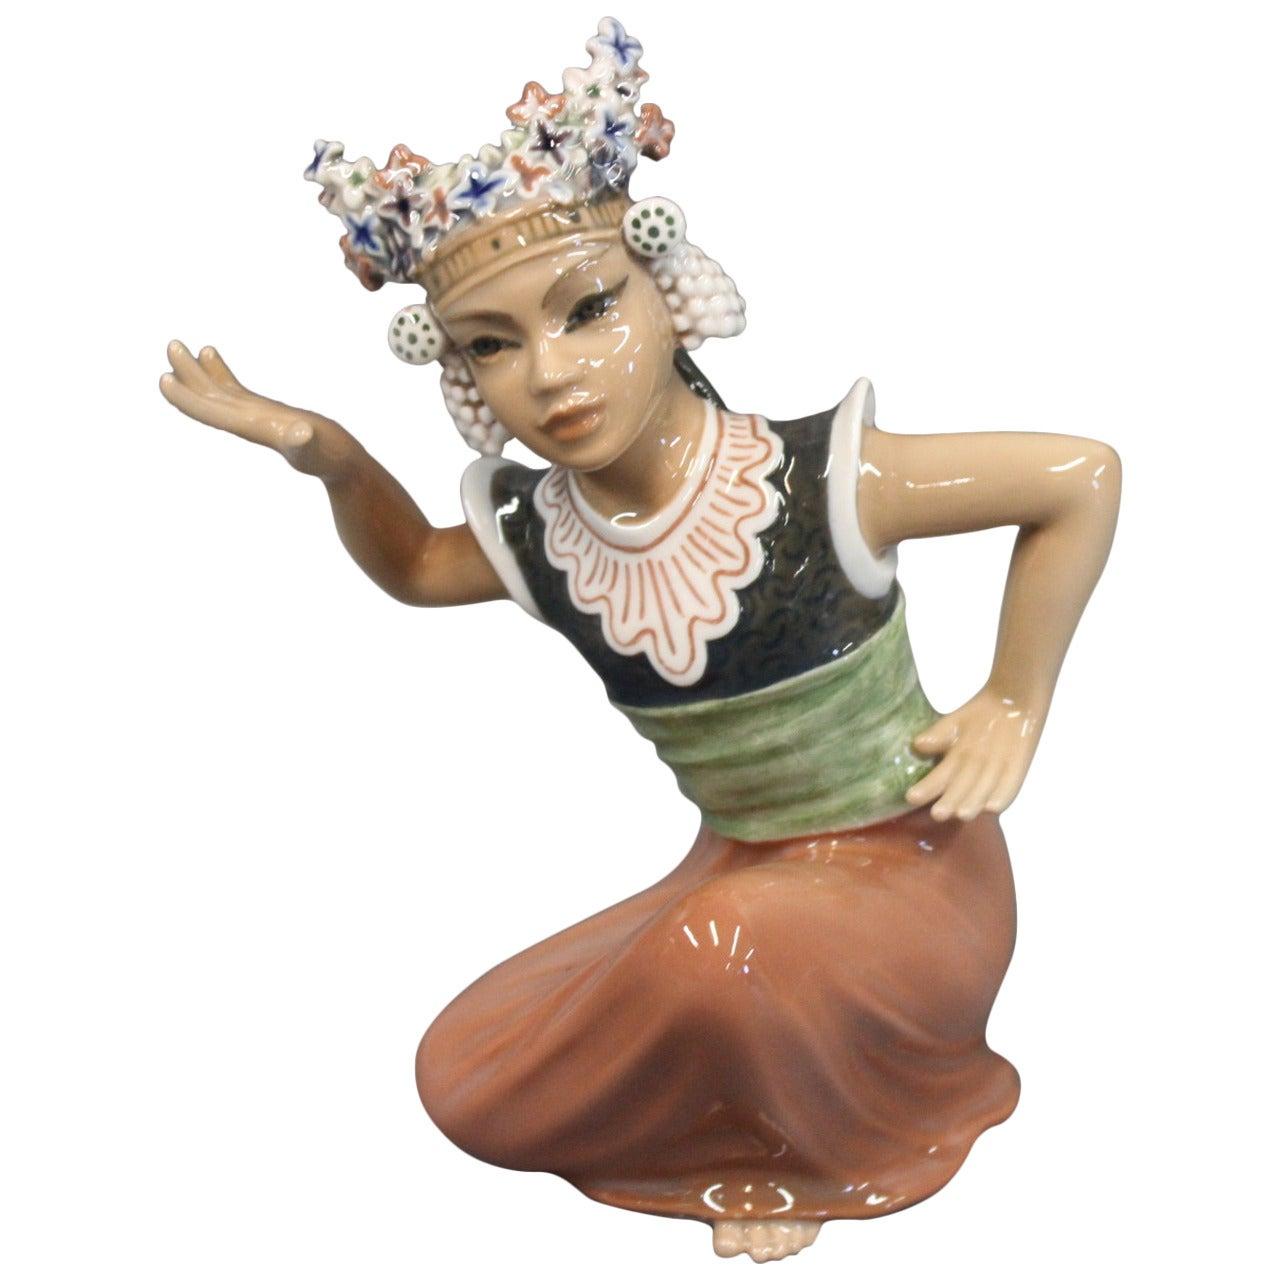 Oriental Porcelain Figurine, Moulia Dancer, No. 1325, by Dahl Jensen